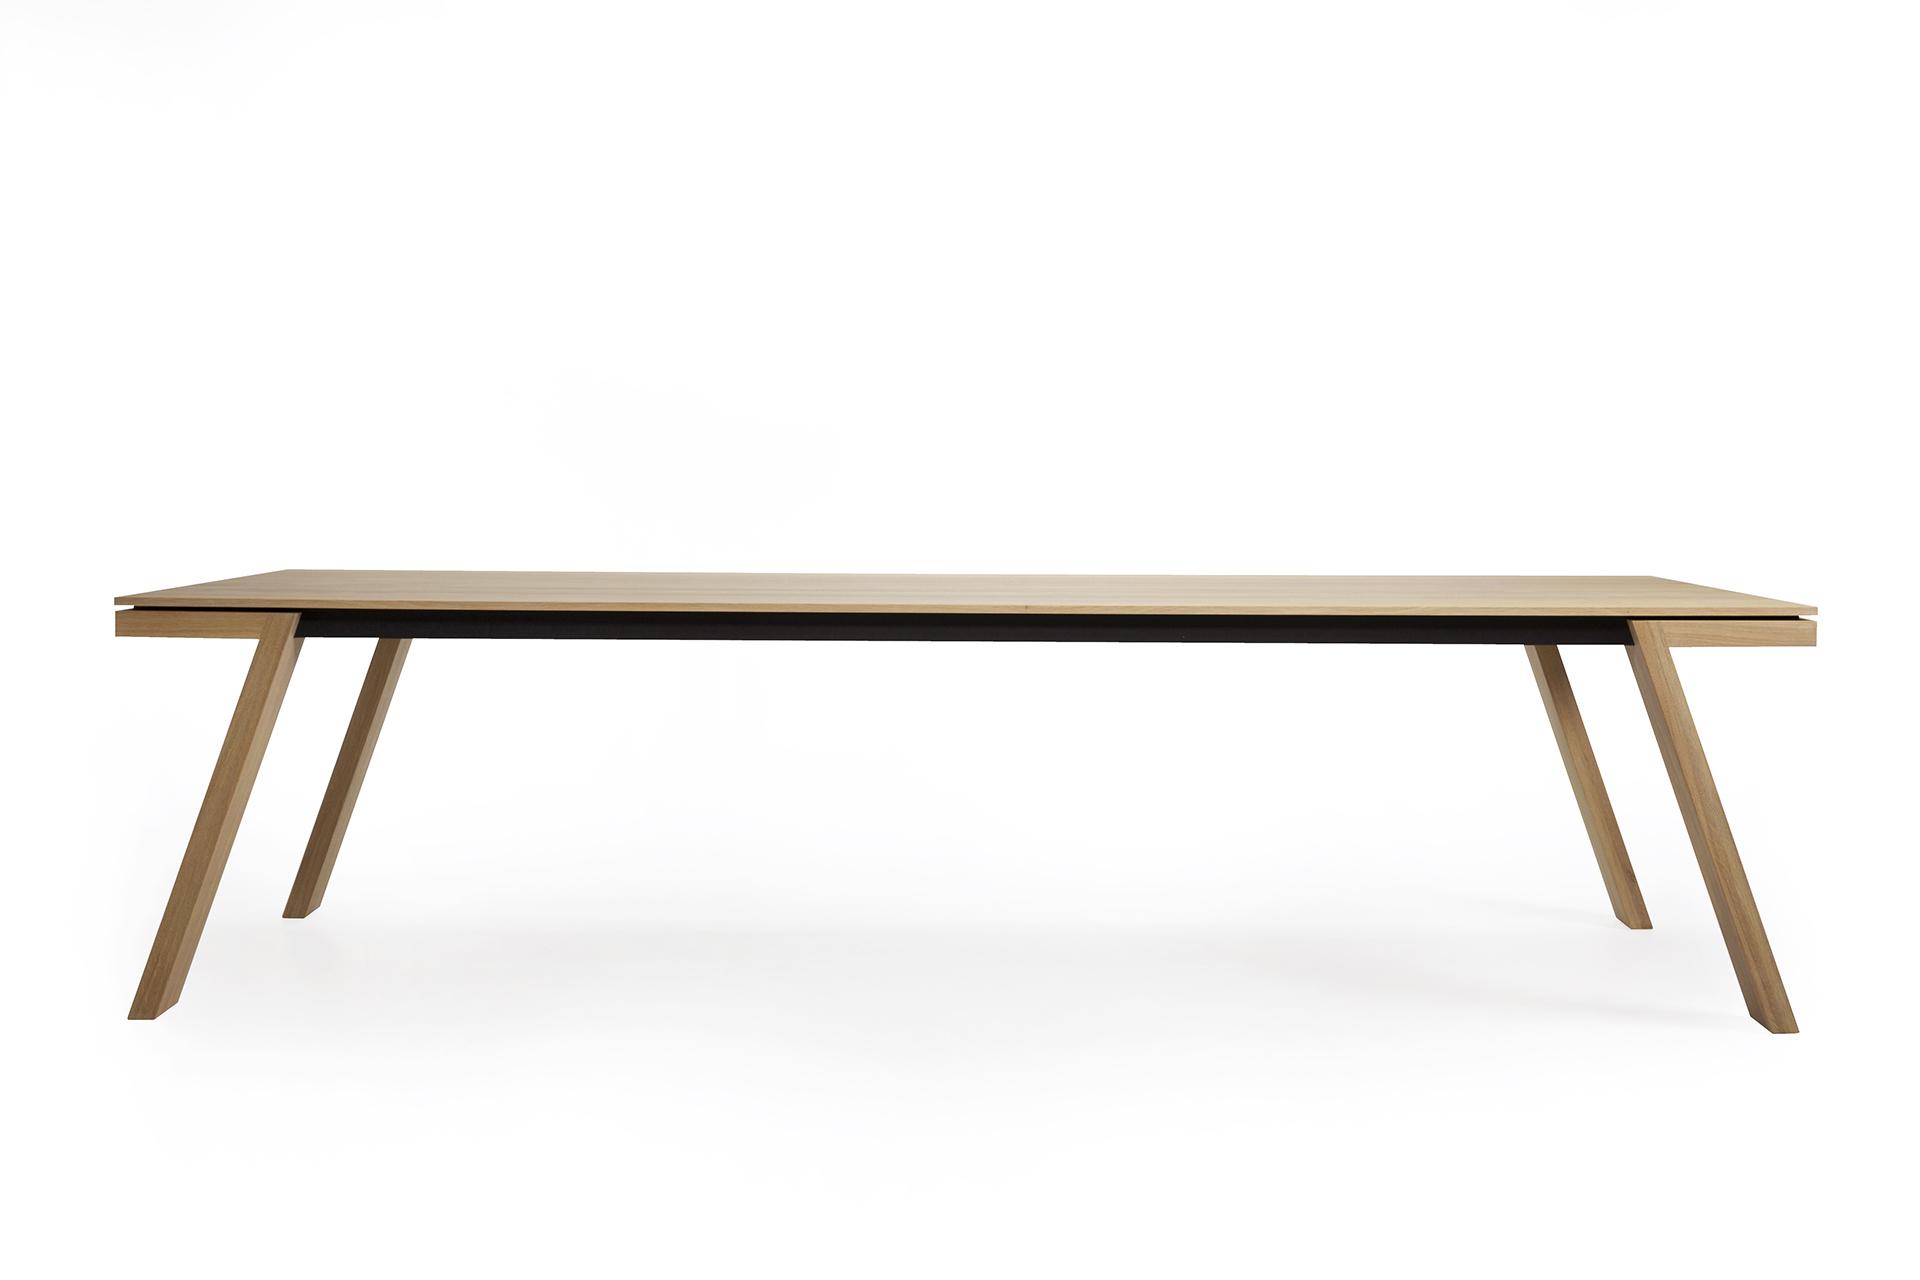 Tafel Eiken 300 Cm.Design Eettafel Spring L Kees Marcelis L Odesi Your Dutch Design